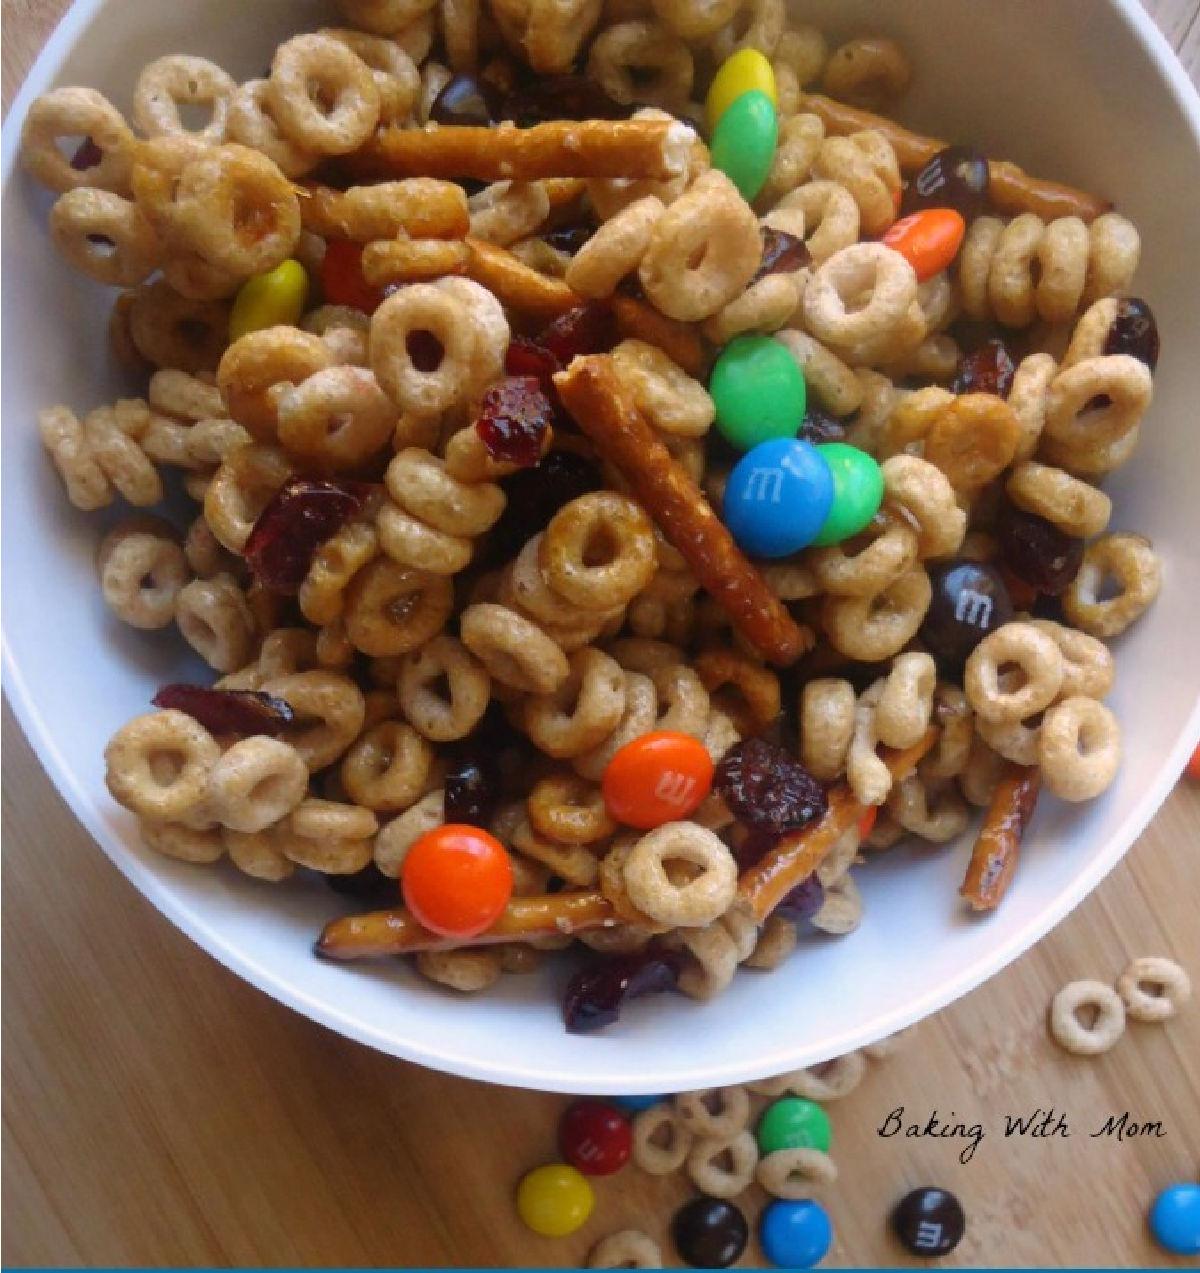 cheerios, m&m's, pretzels in a white bowl